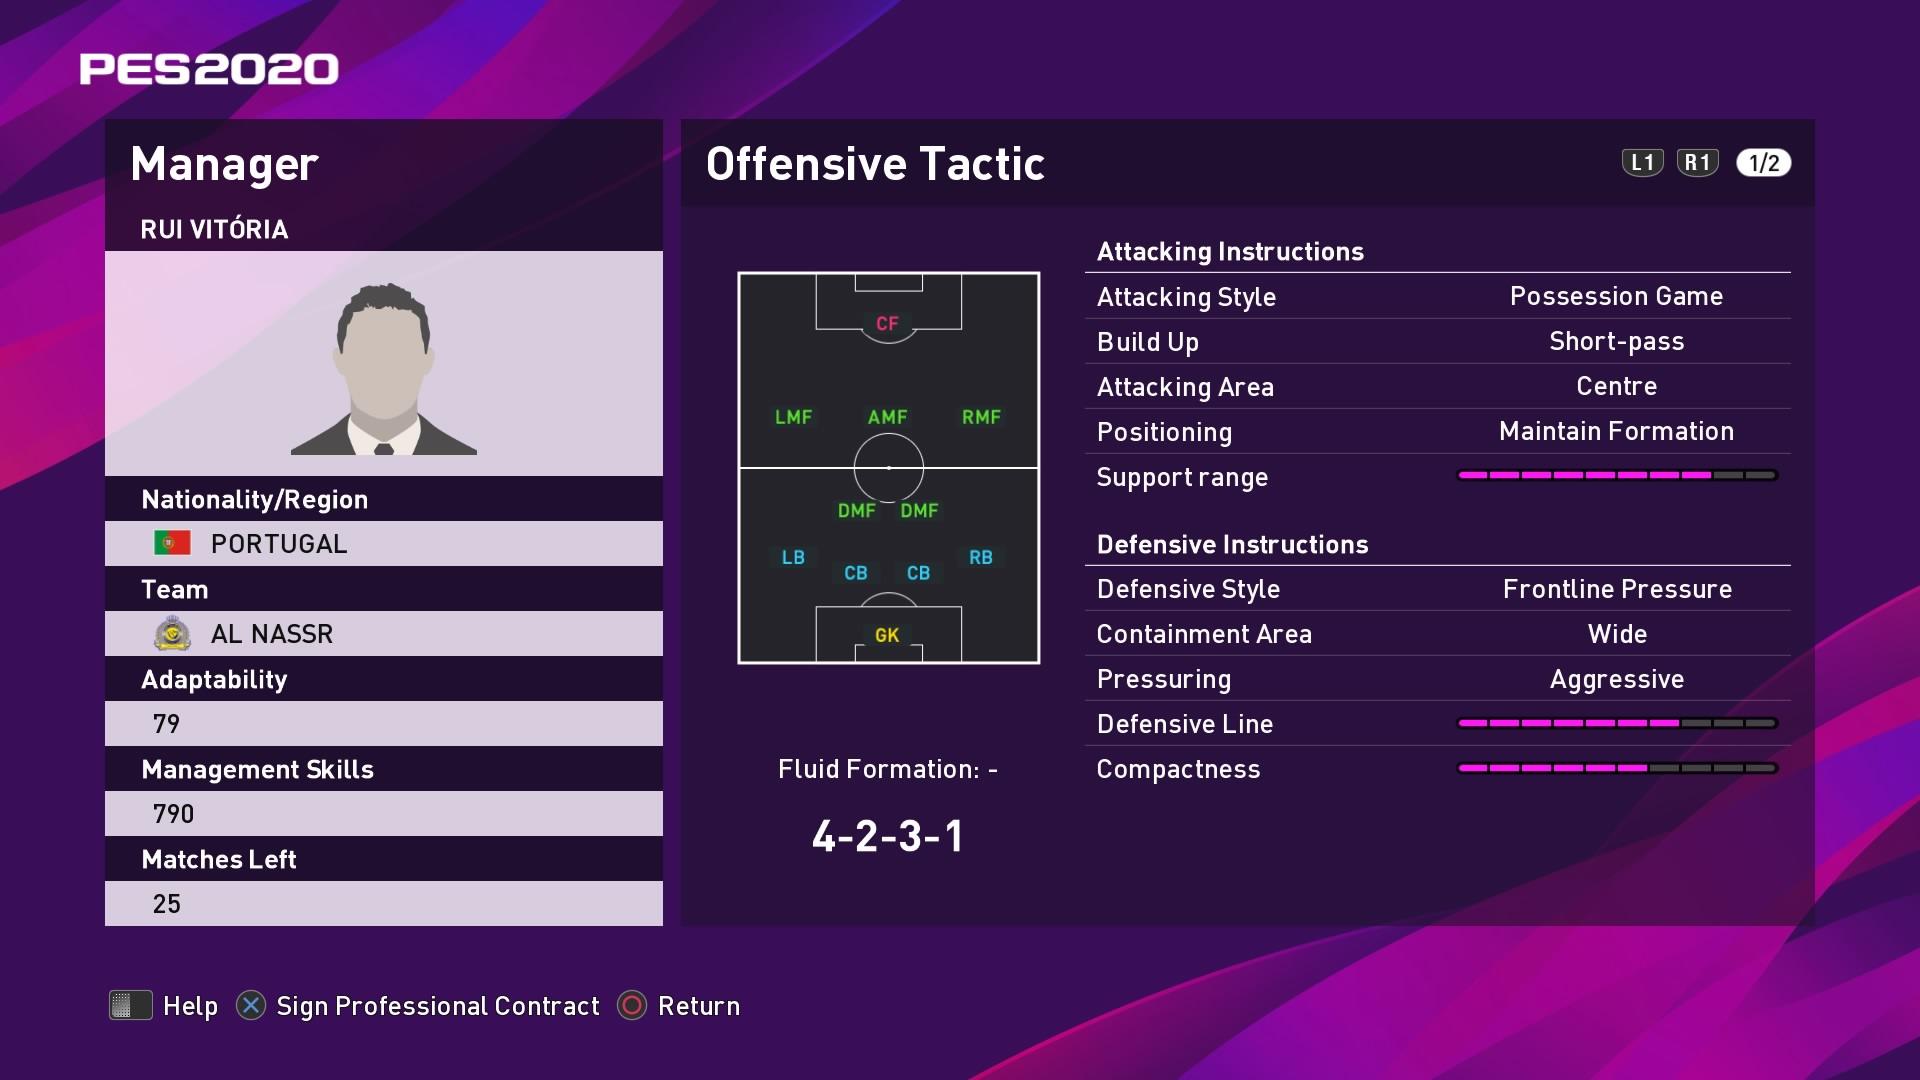 Rui Vitória Offensive Tactic in PES 2020 myClub